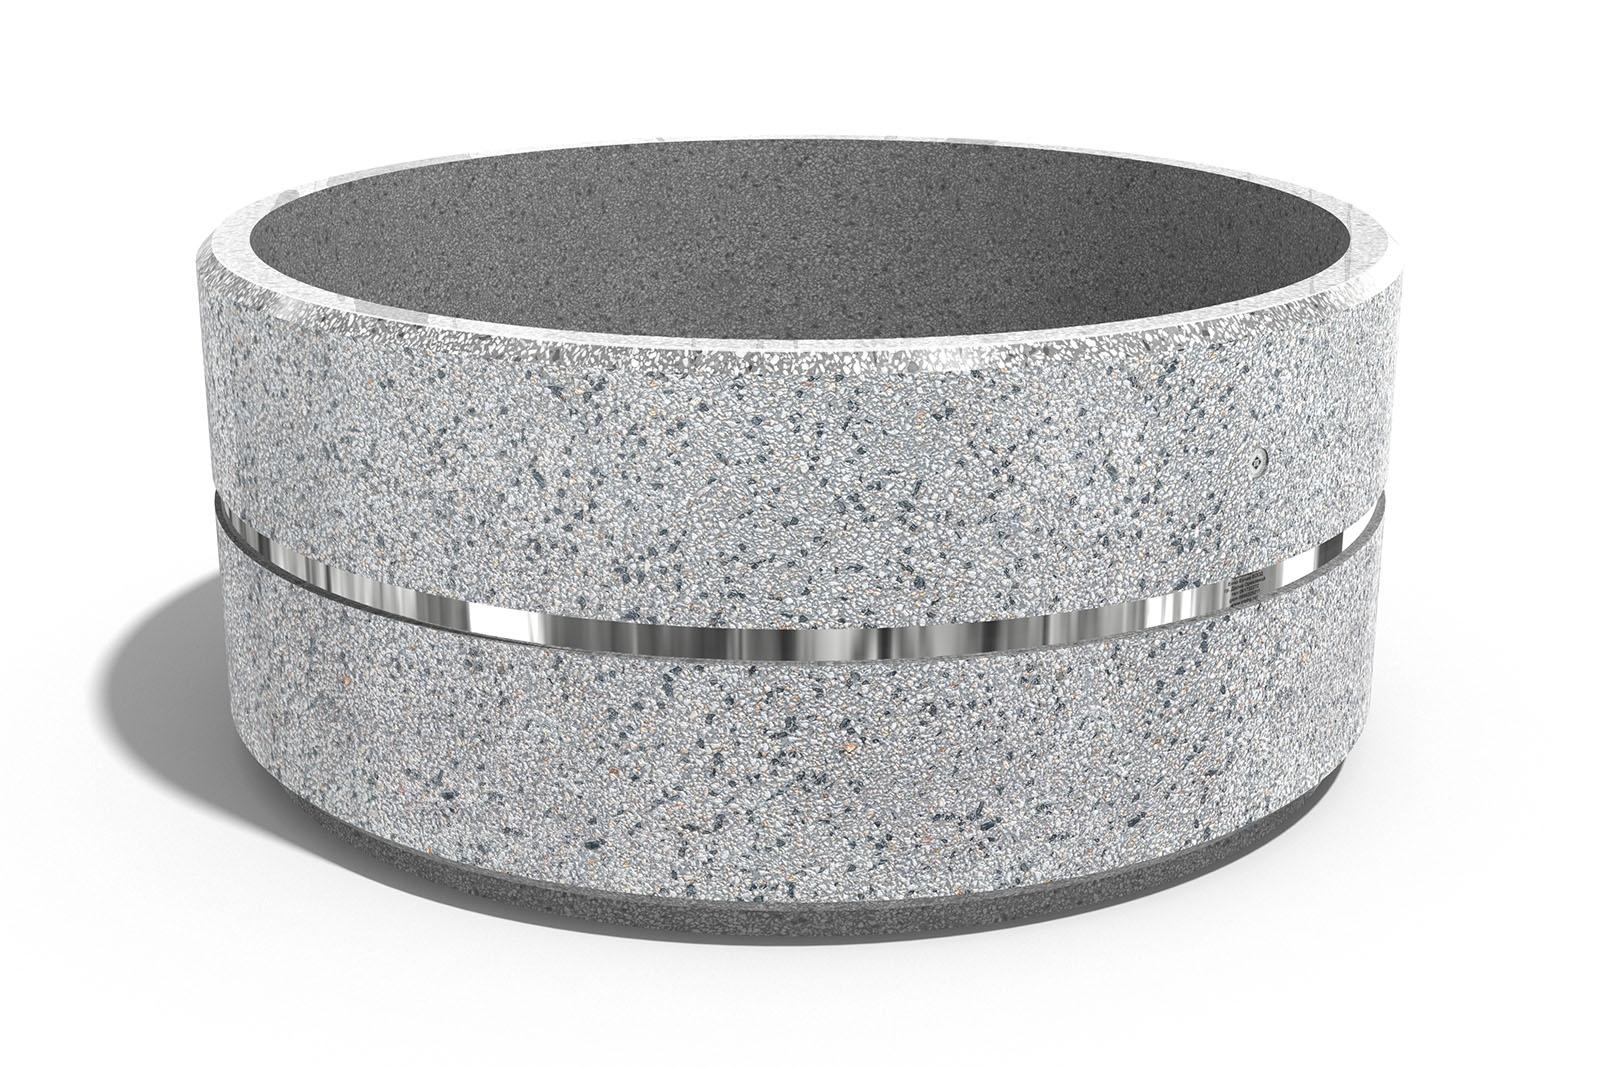 pflanzkübel aus beton - modell 95